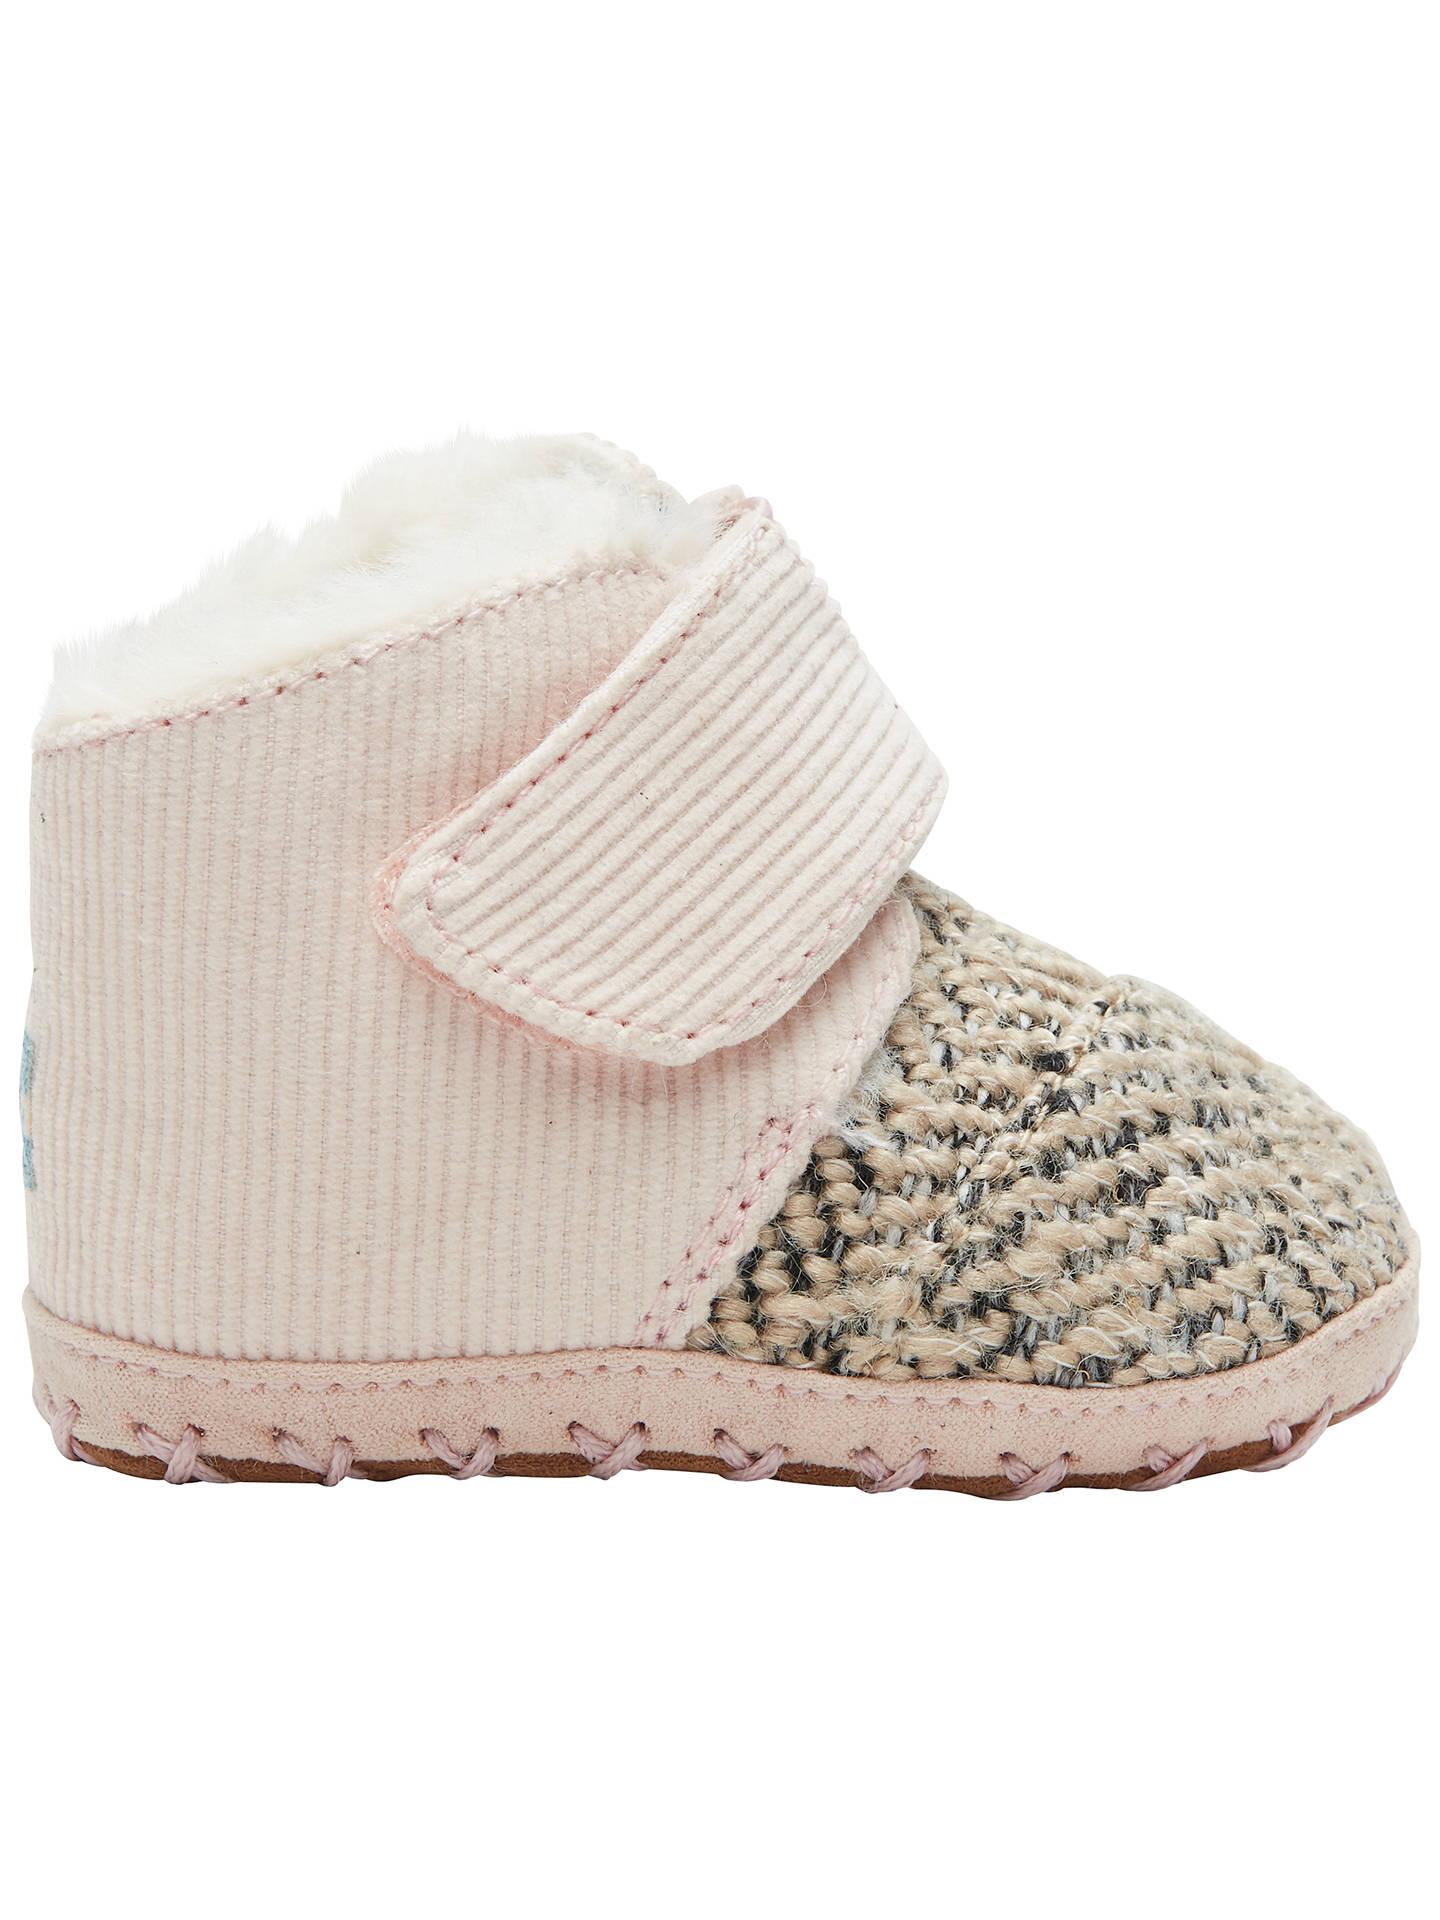 fc26eb2500c Buy TOMS Cuna Ribbed Crib Boots